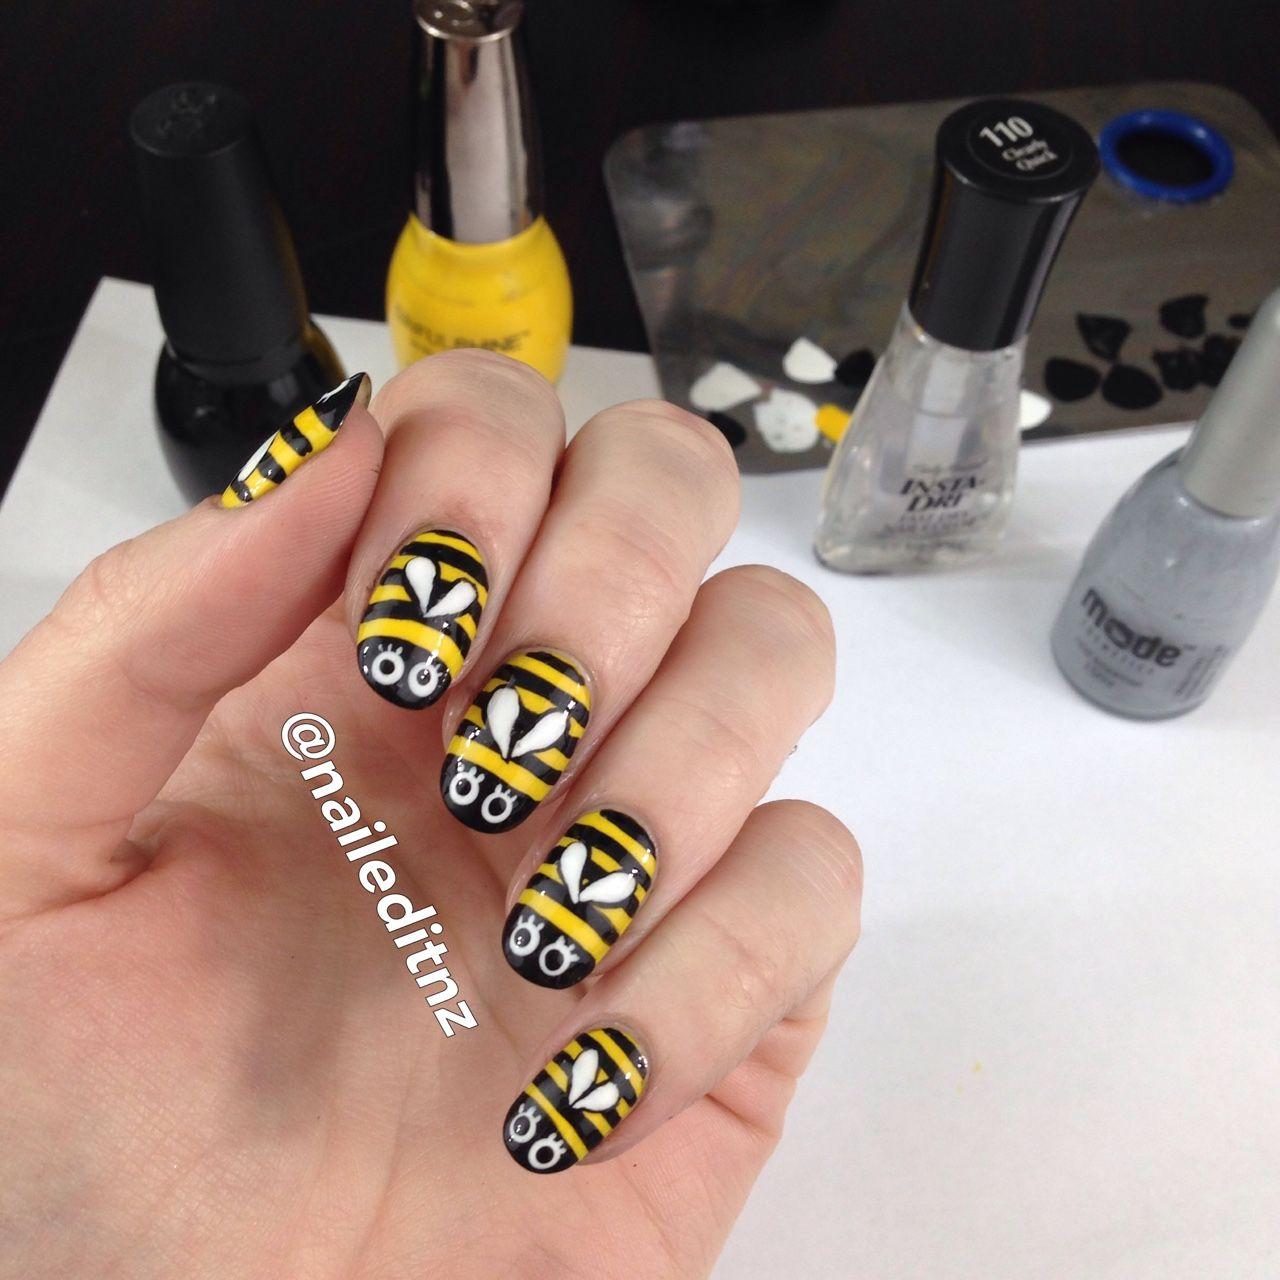 Cute Bumblebee Nail Art On A Lazy Saturday Nails Pinterest